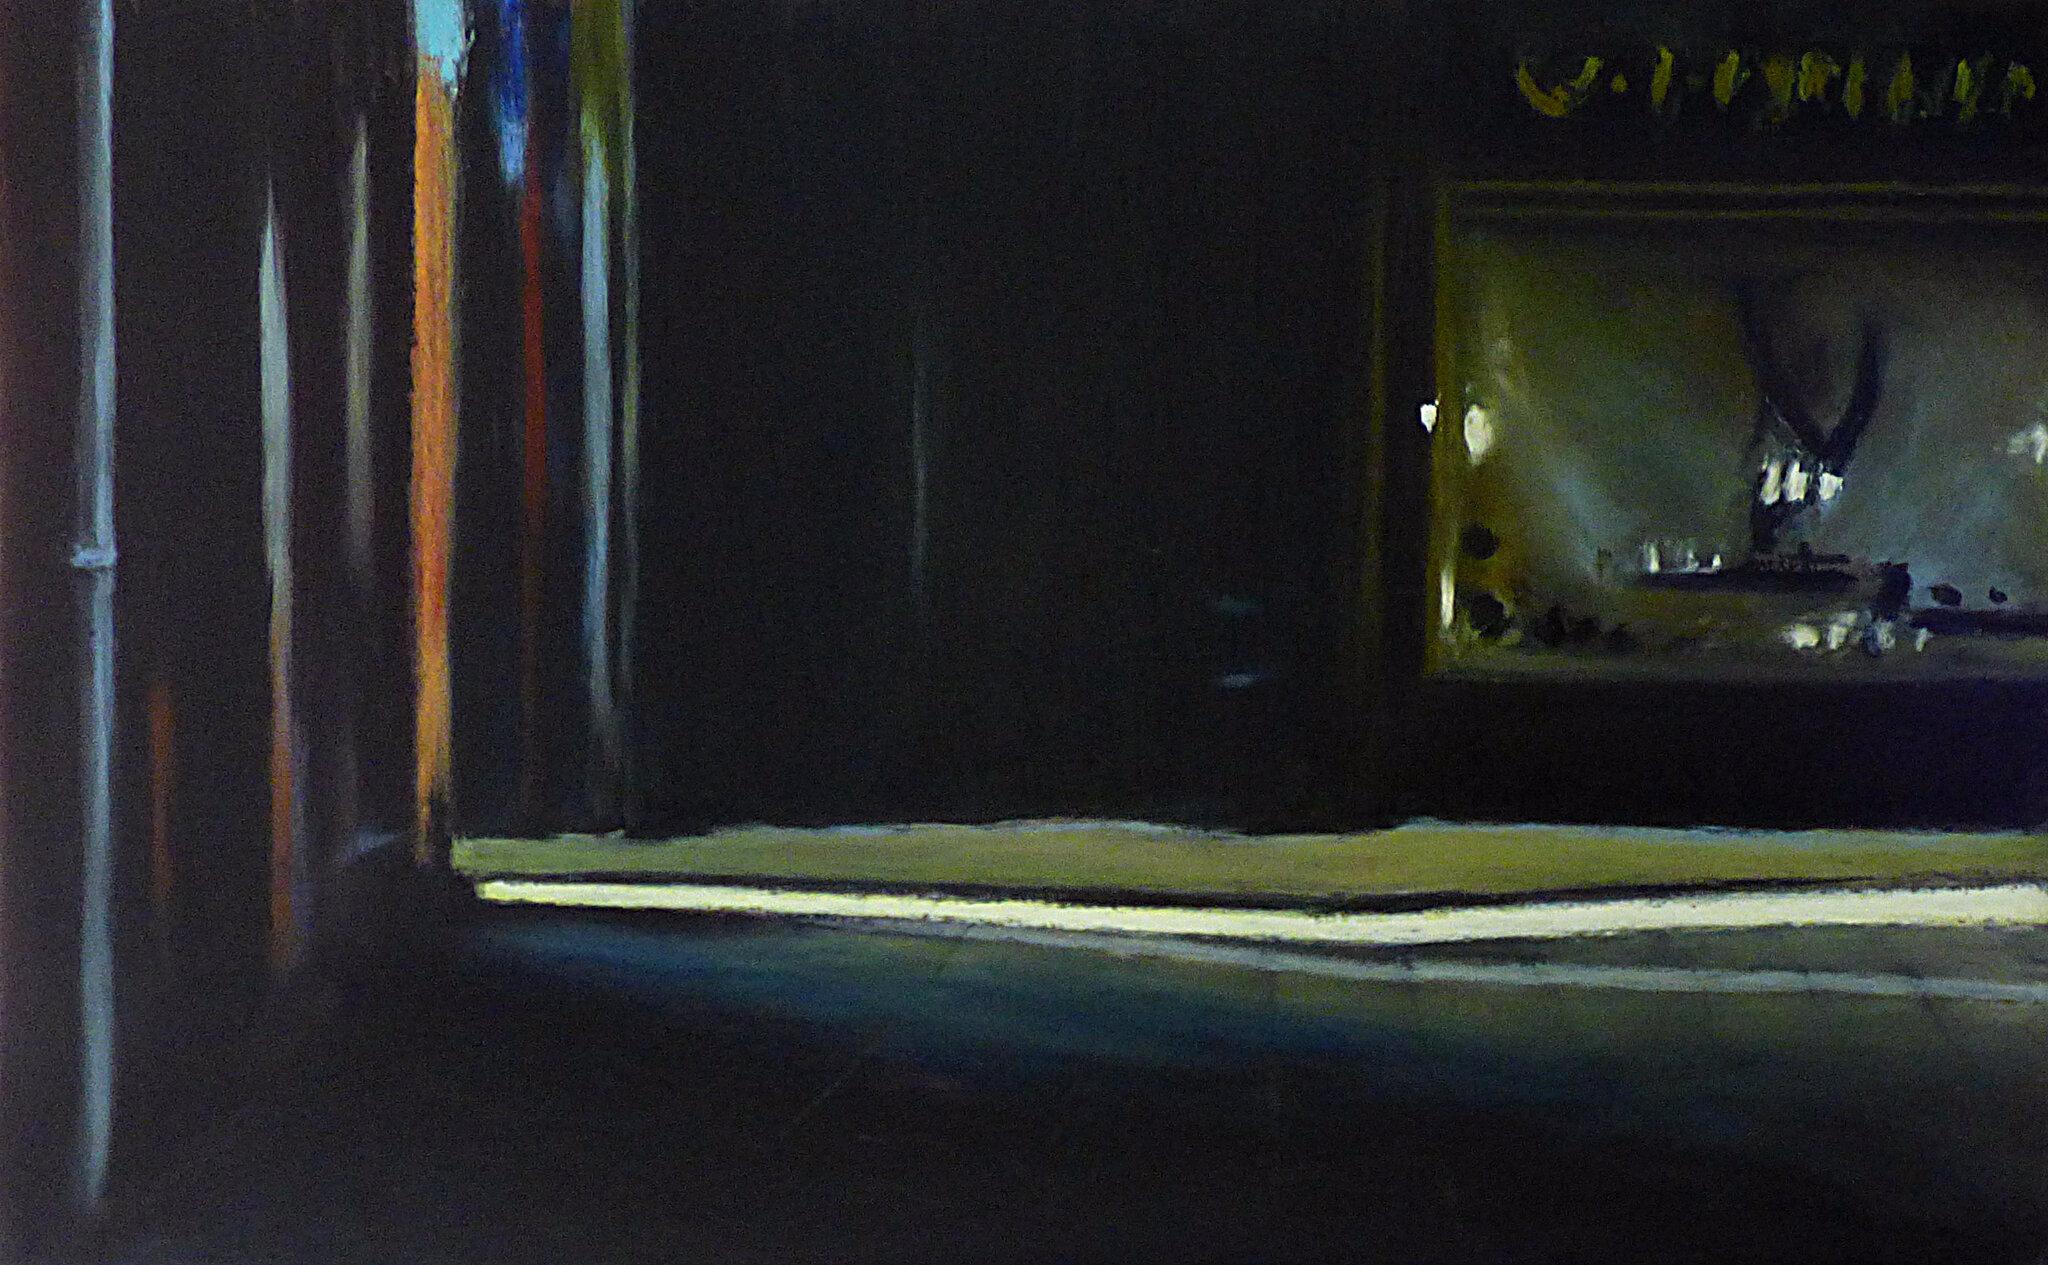 K'nowhere 83, août 2017, pastel à l'huile, 48 x 32 cm